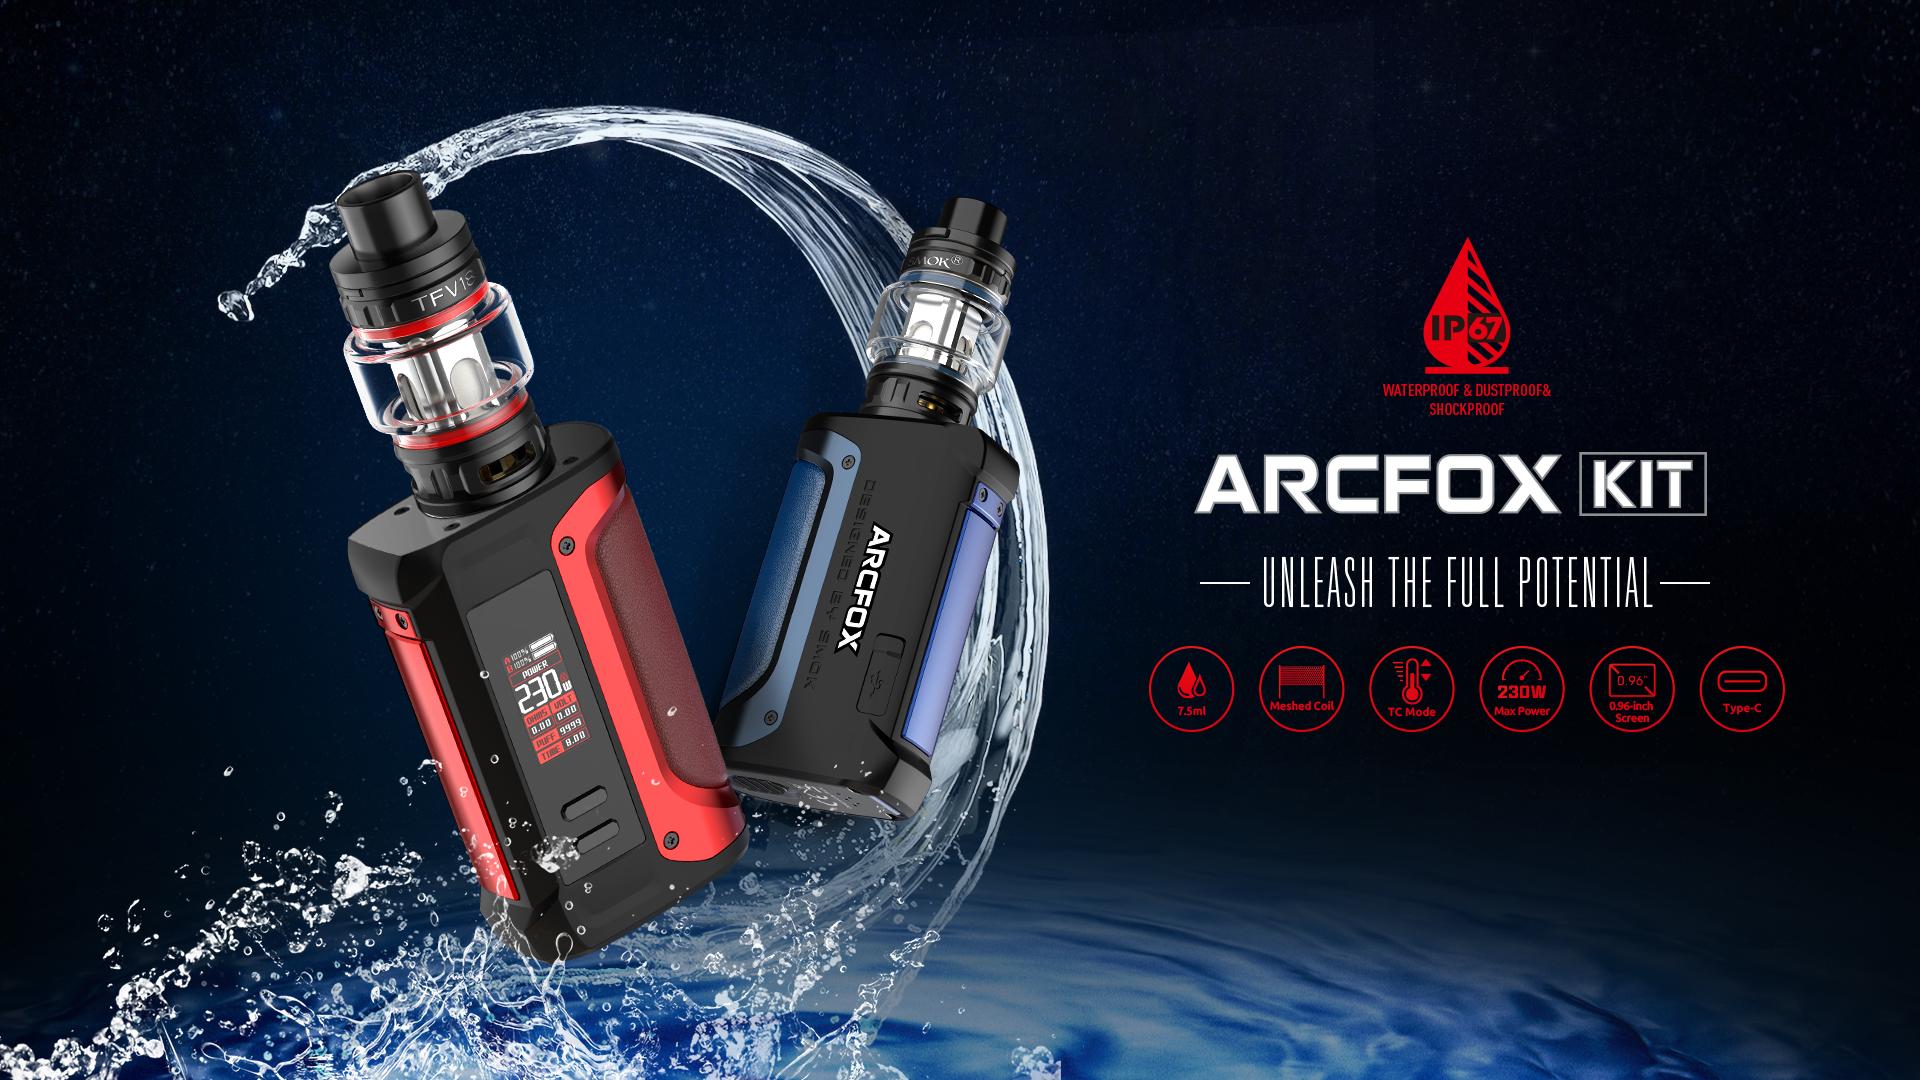 arcfox kit